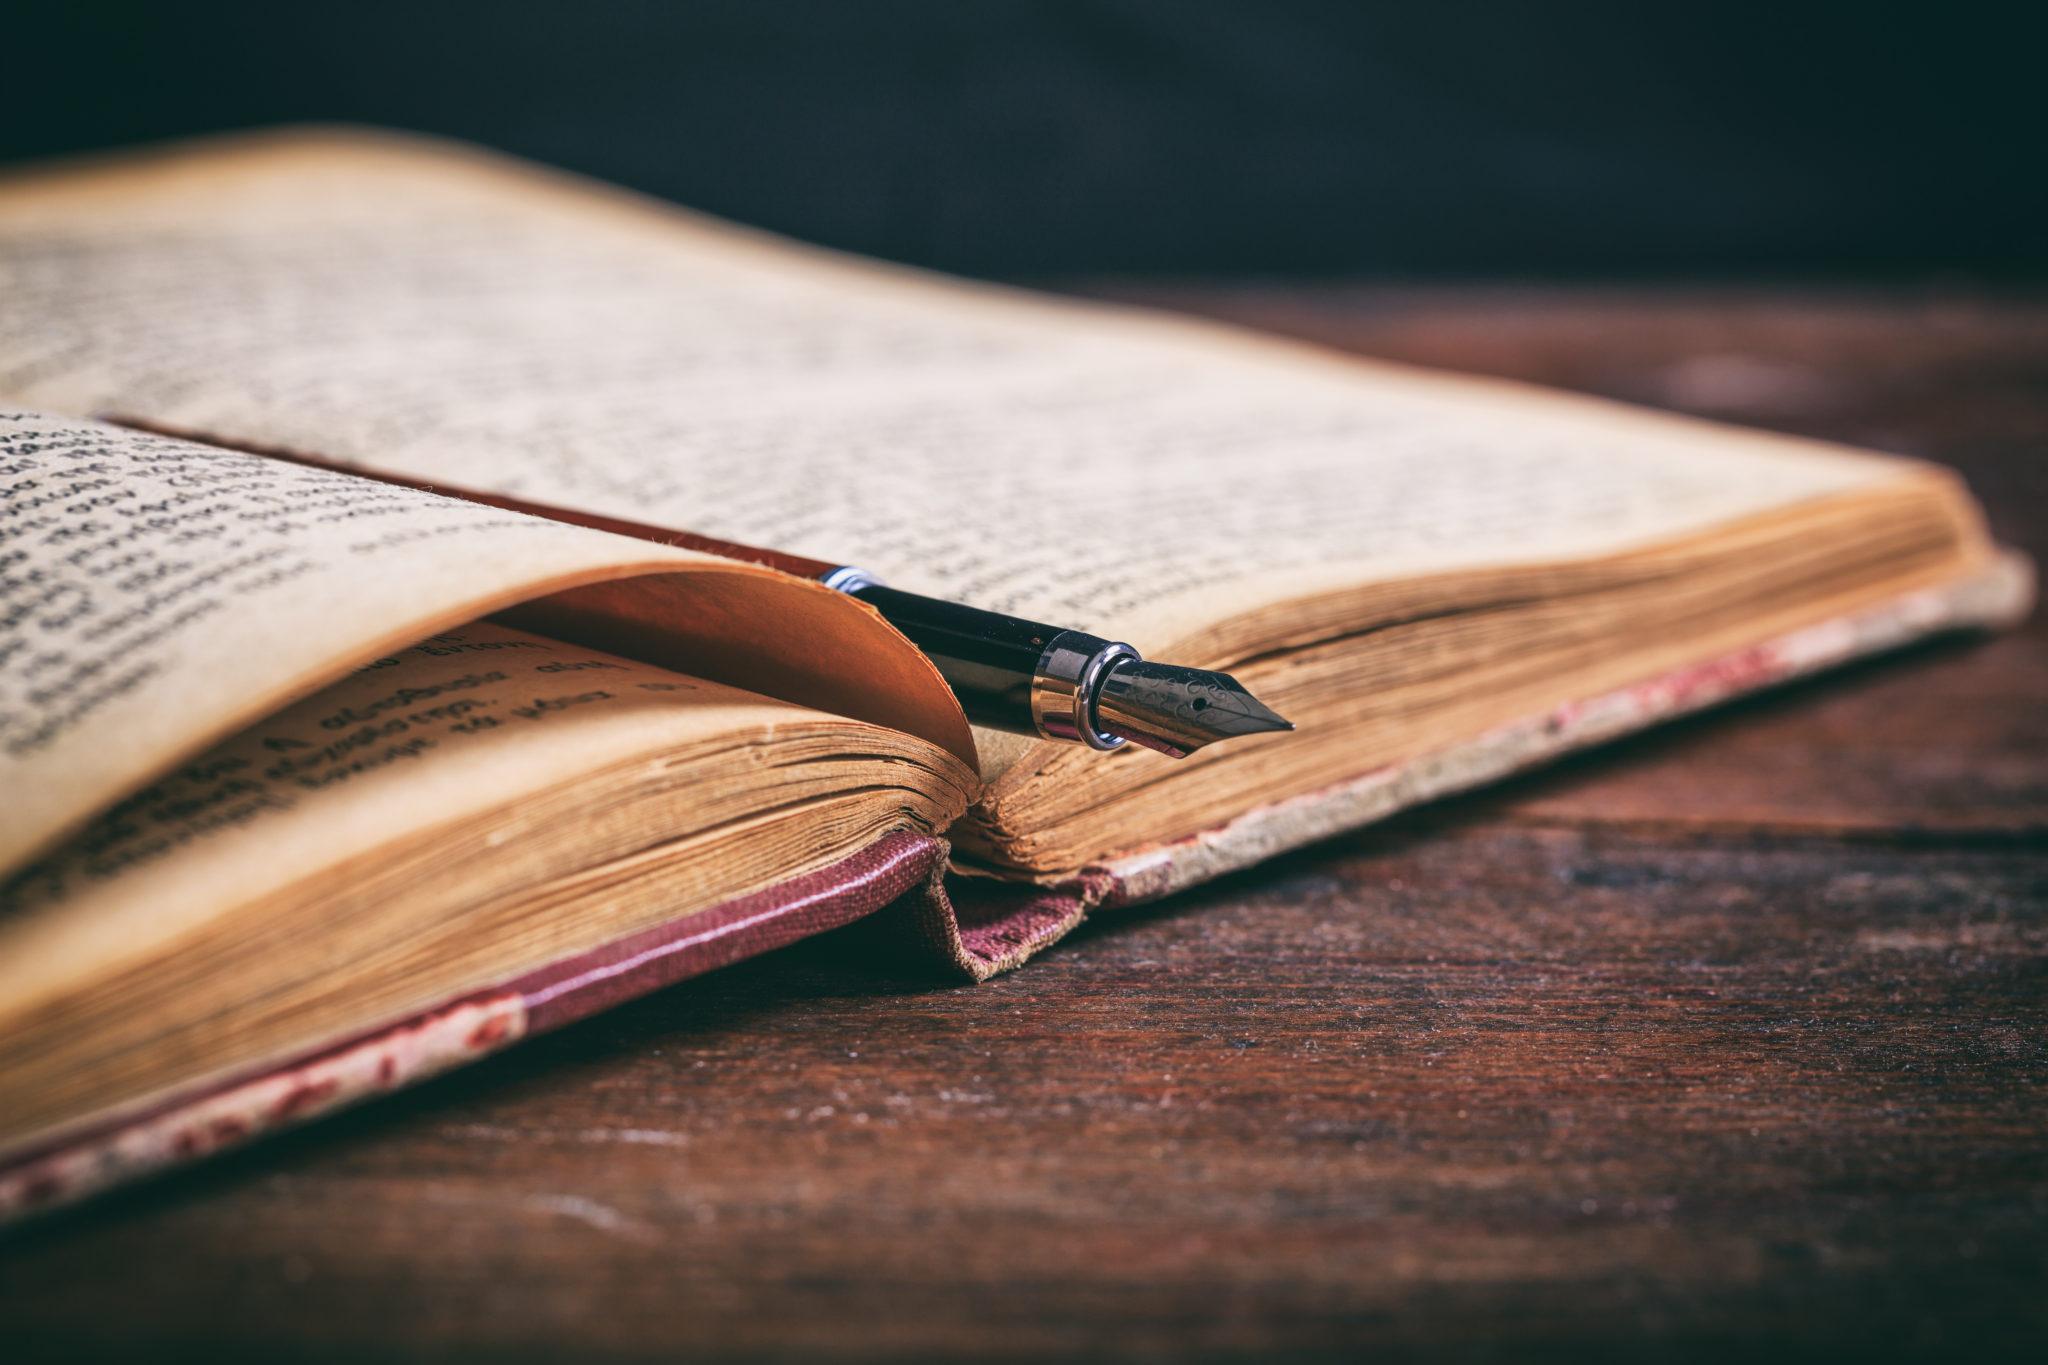 Vintage book and ink pen on a wooden desk